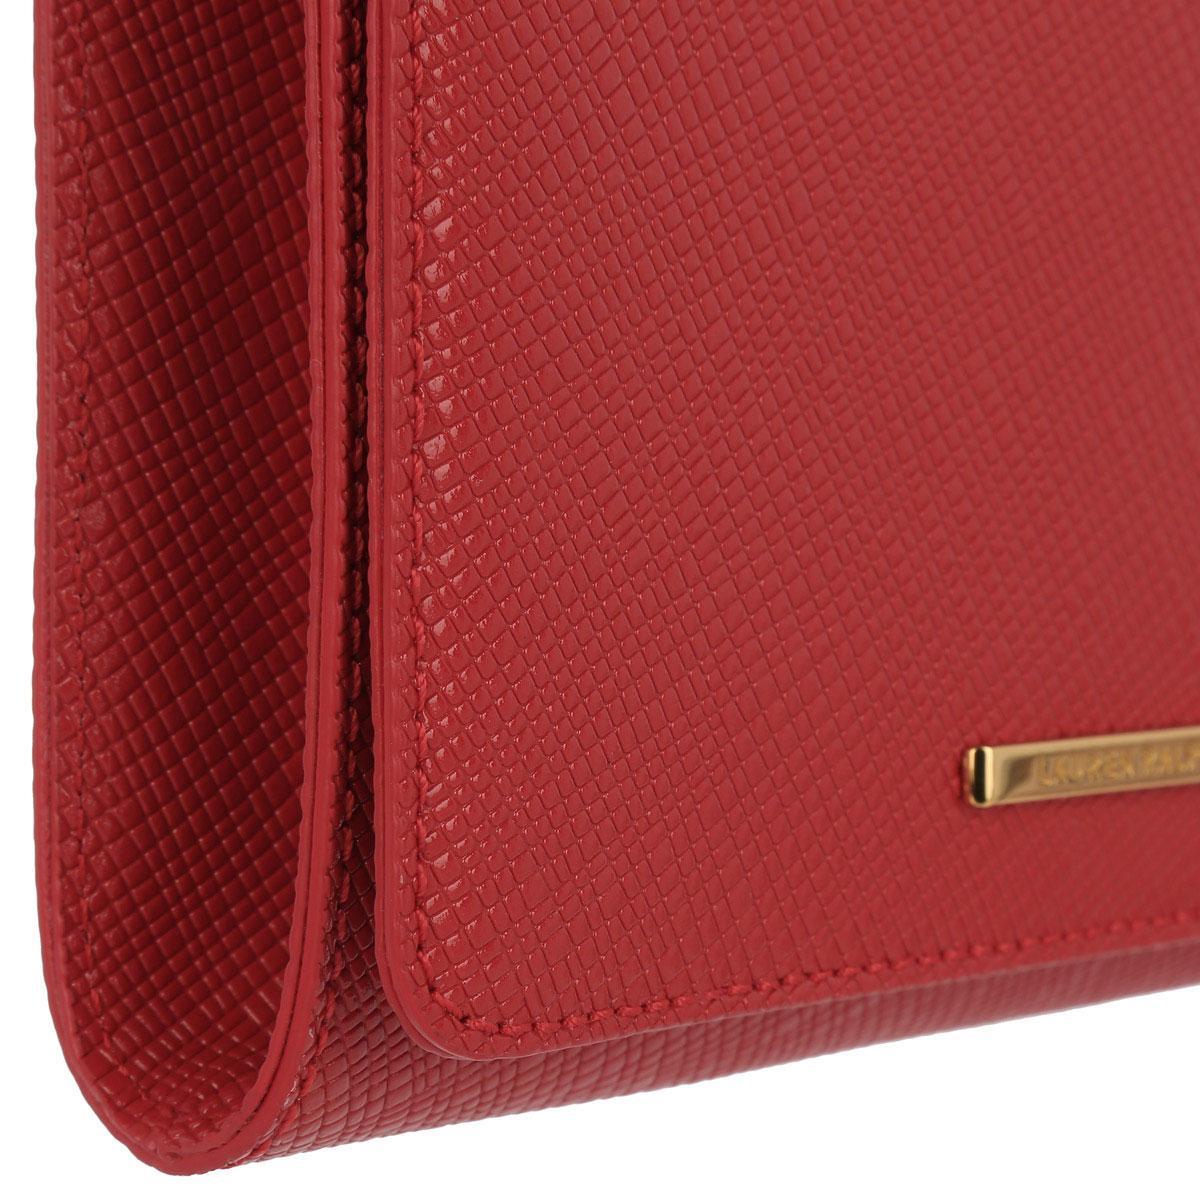 Lyst - Lauren By Ralph Lauren Delaney Leather Clutch Tango Red in Red ea52f1da82